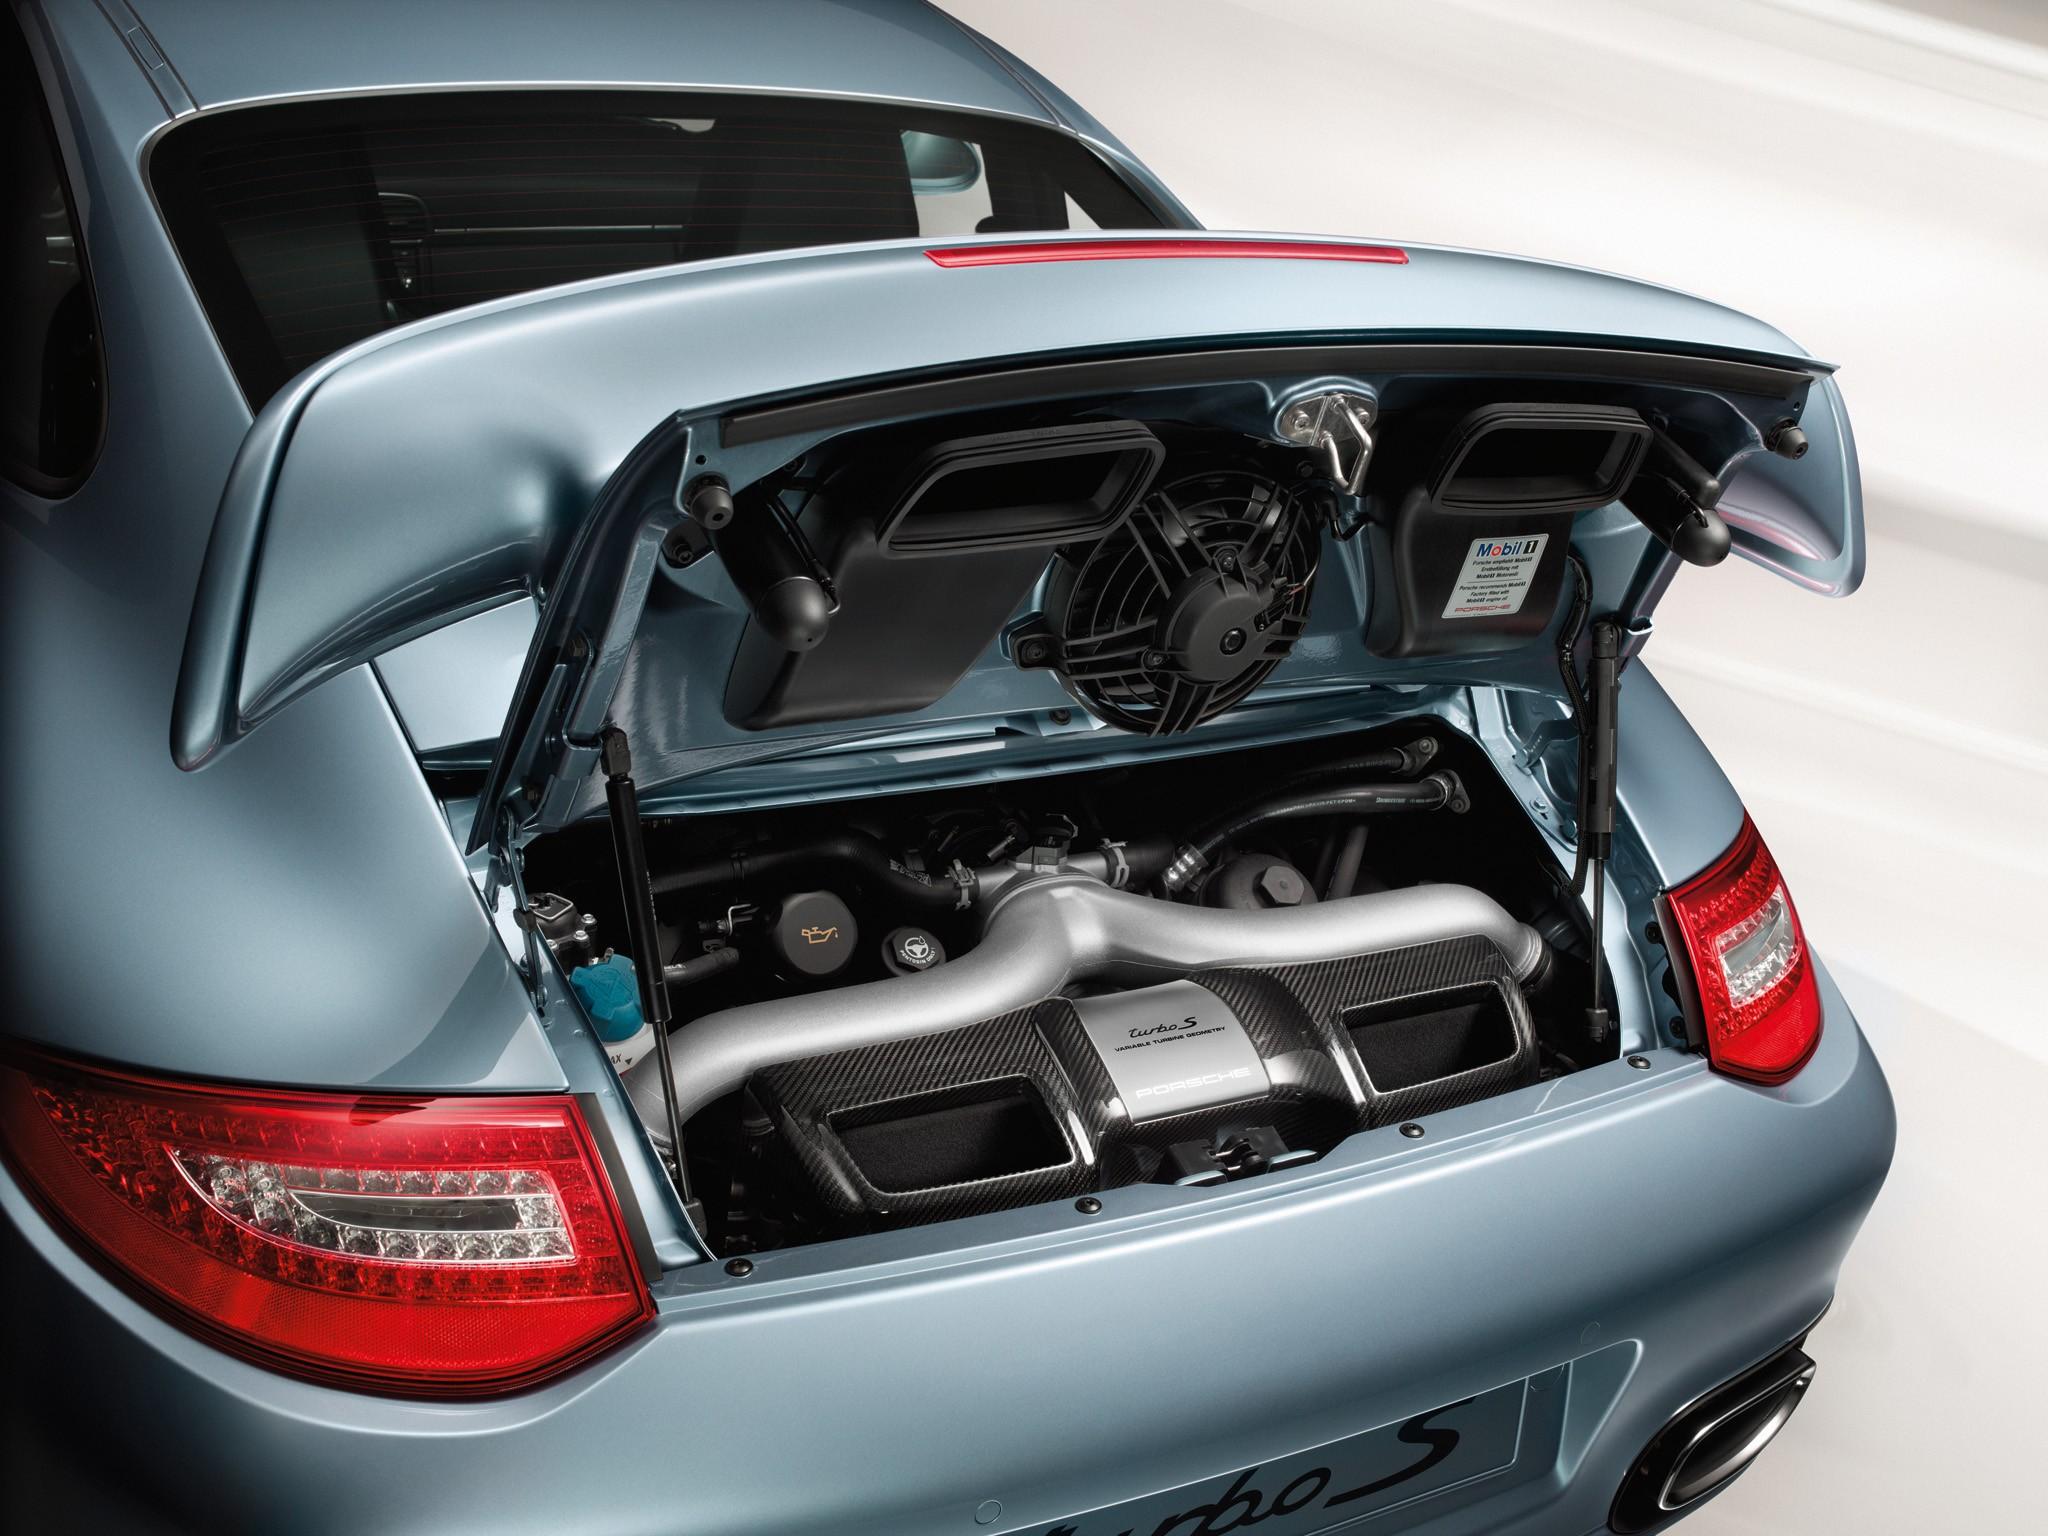 PORSCHE 911 Turbo S (997) specs & photos - 2010, 2011 - autoevolution